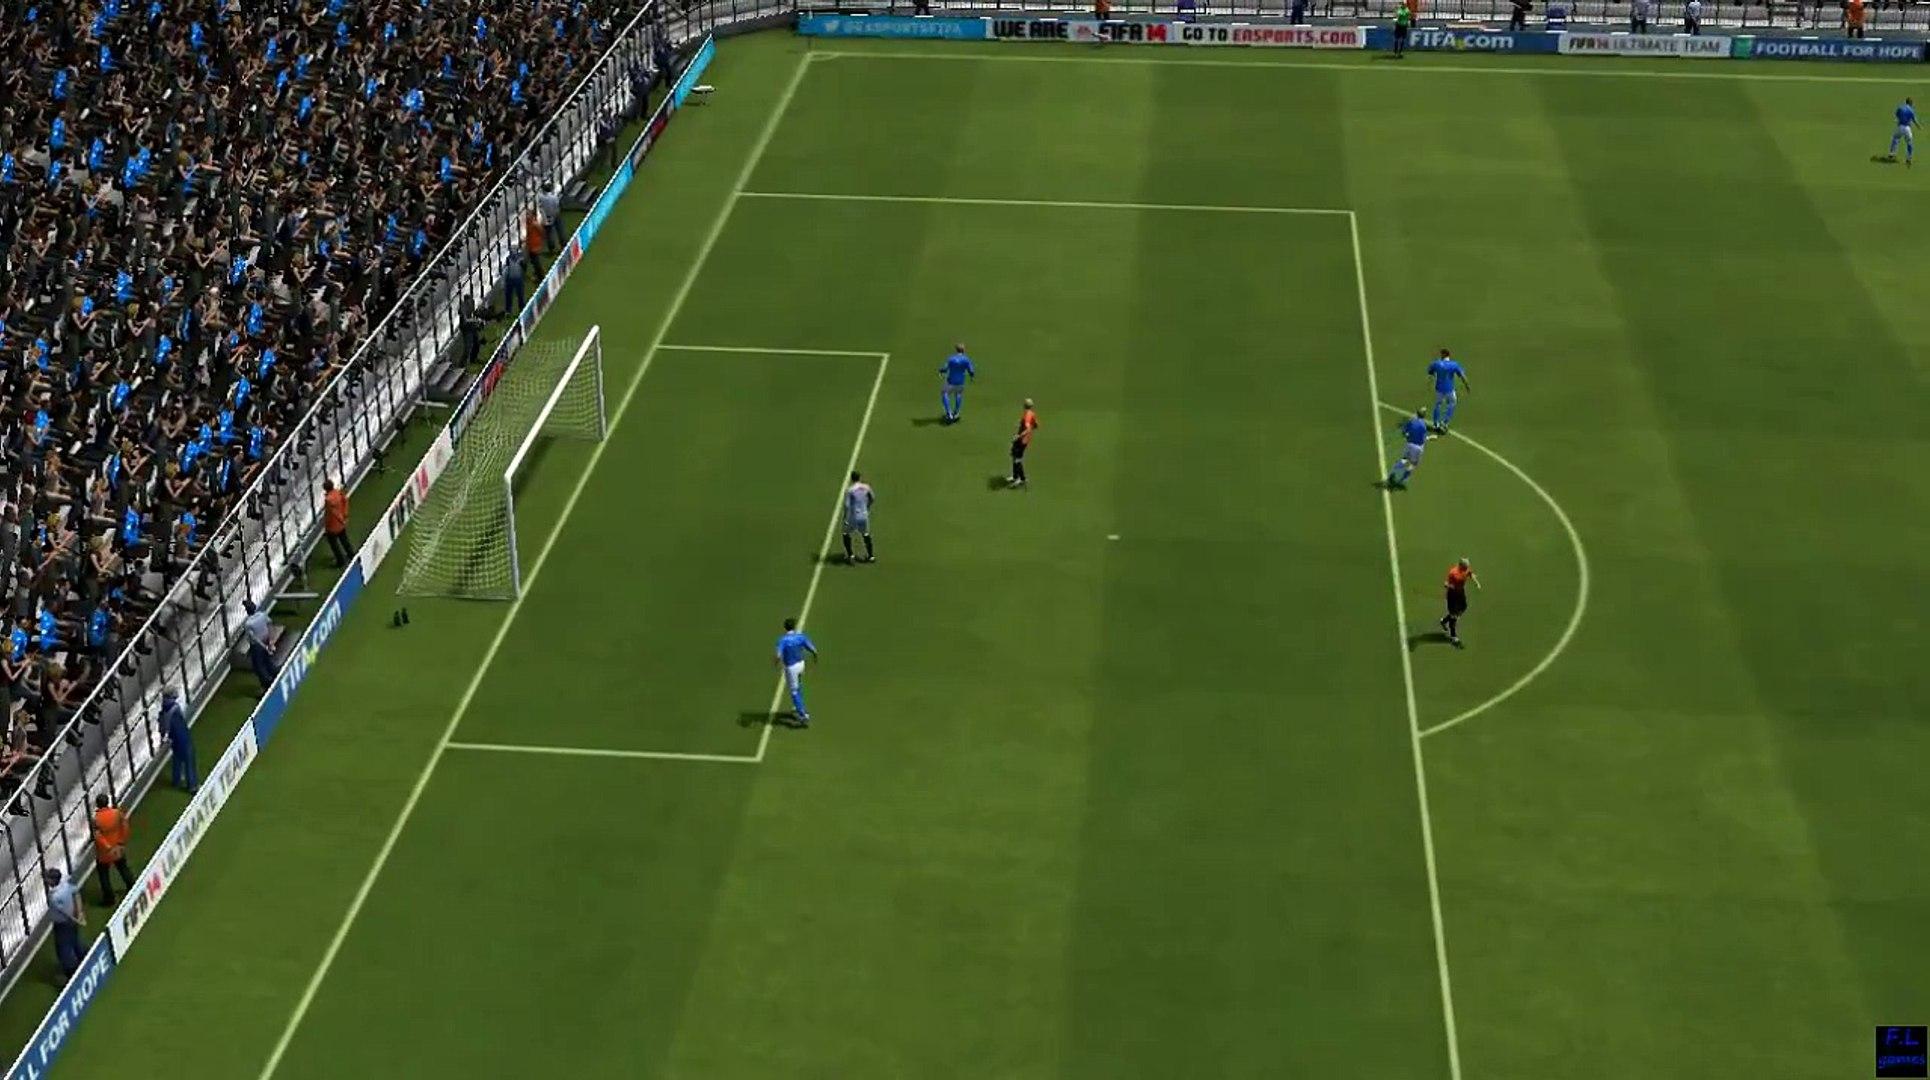 St Johnstone v Dundee United - Scottish Premier League - Simulation FIFA EA